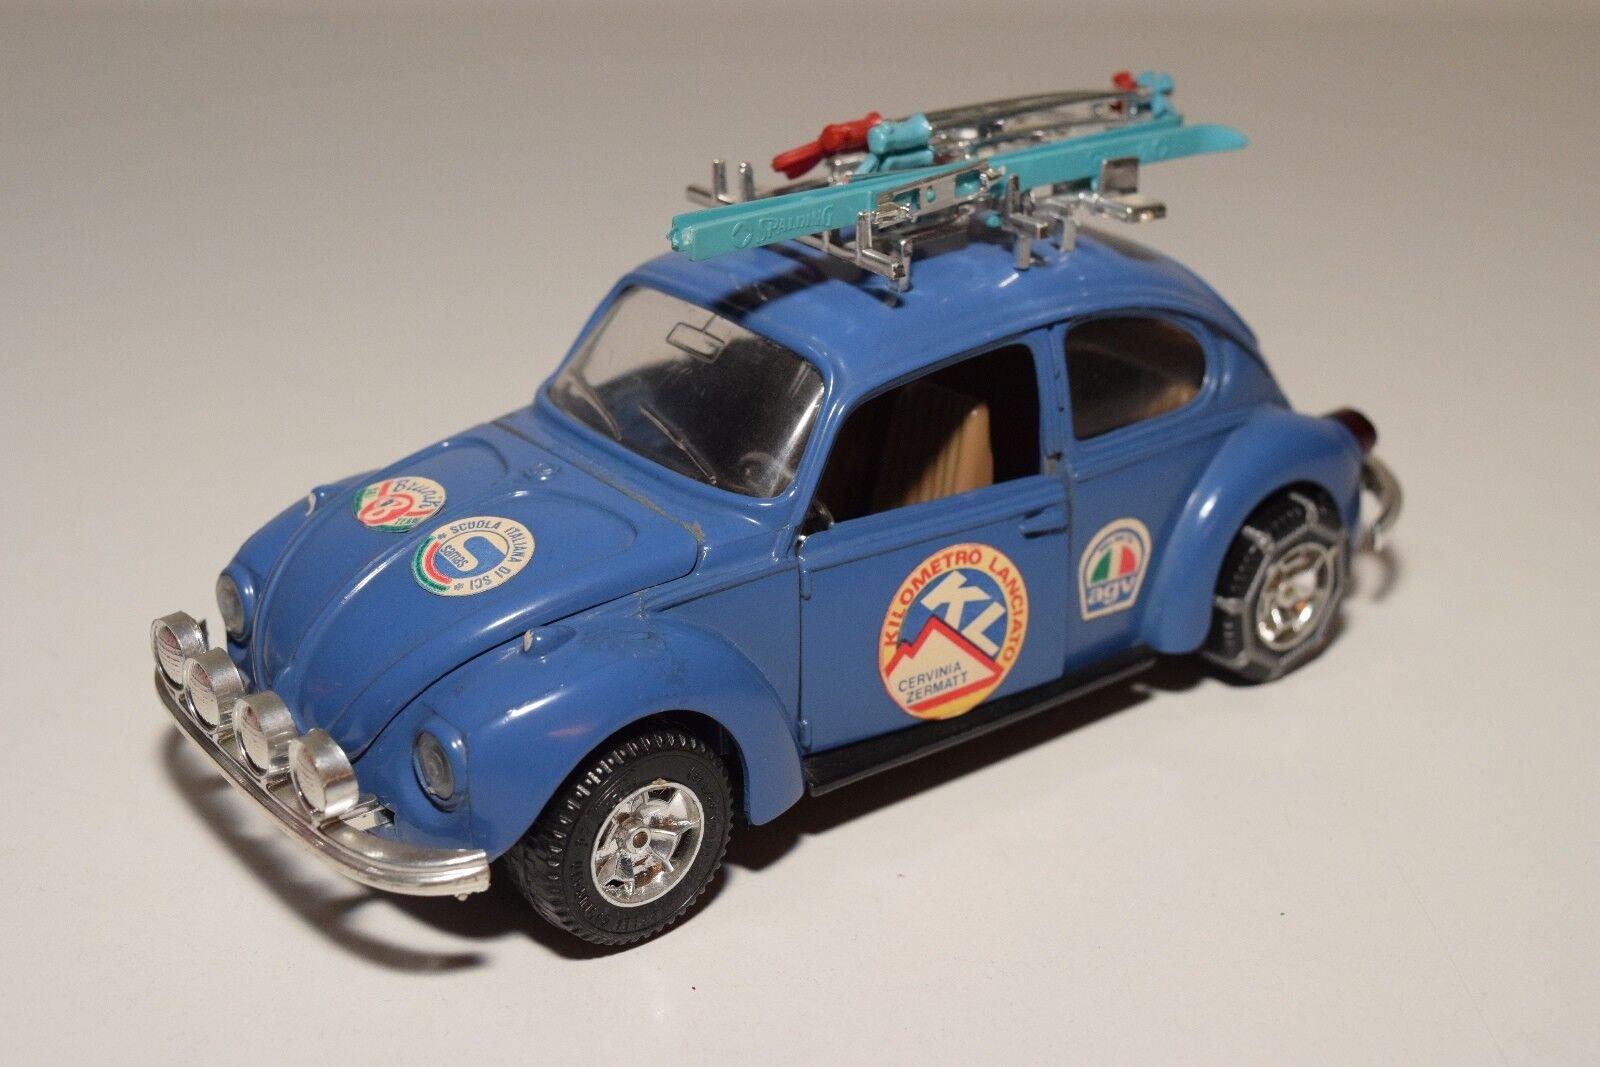 K MEBETOYS 8615 VW VOLKSWAGEN BEETLE KAFER CON SKI blu NEAR MINT CONDITION RARE